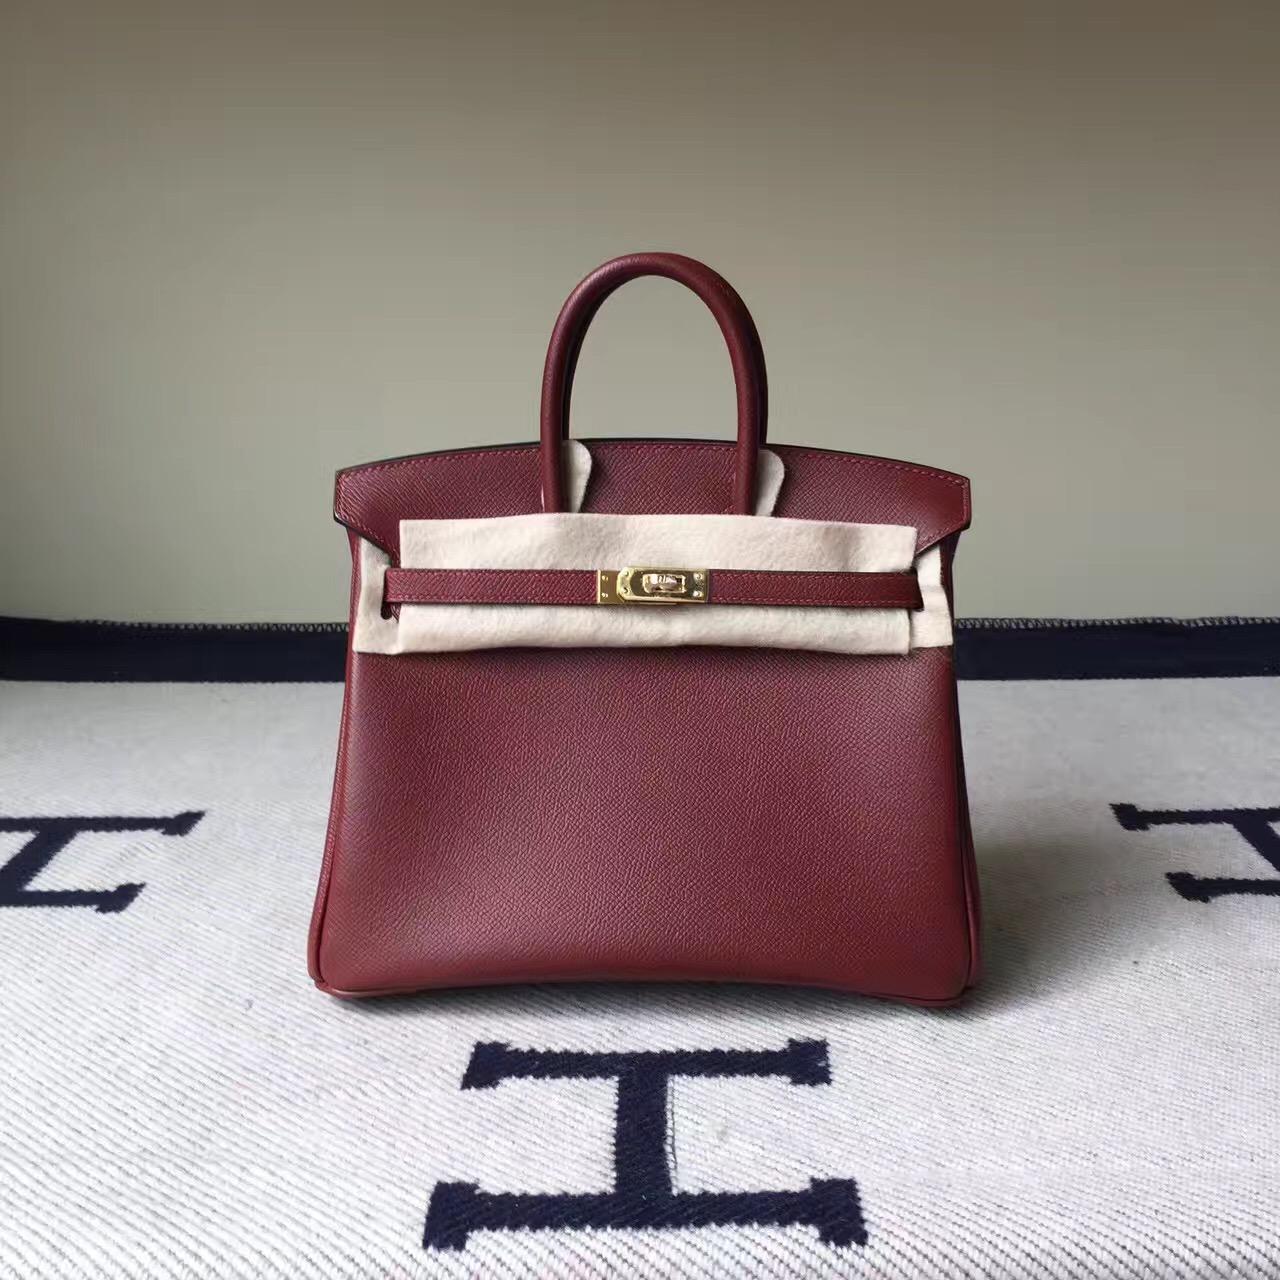 Hand Stitching Hermes CK55 Rouge Hermes Epsom Leather Birkin25cm Tote Bag